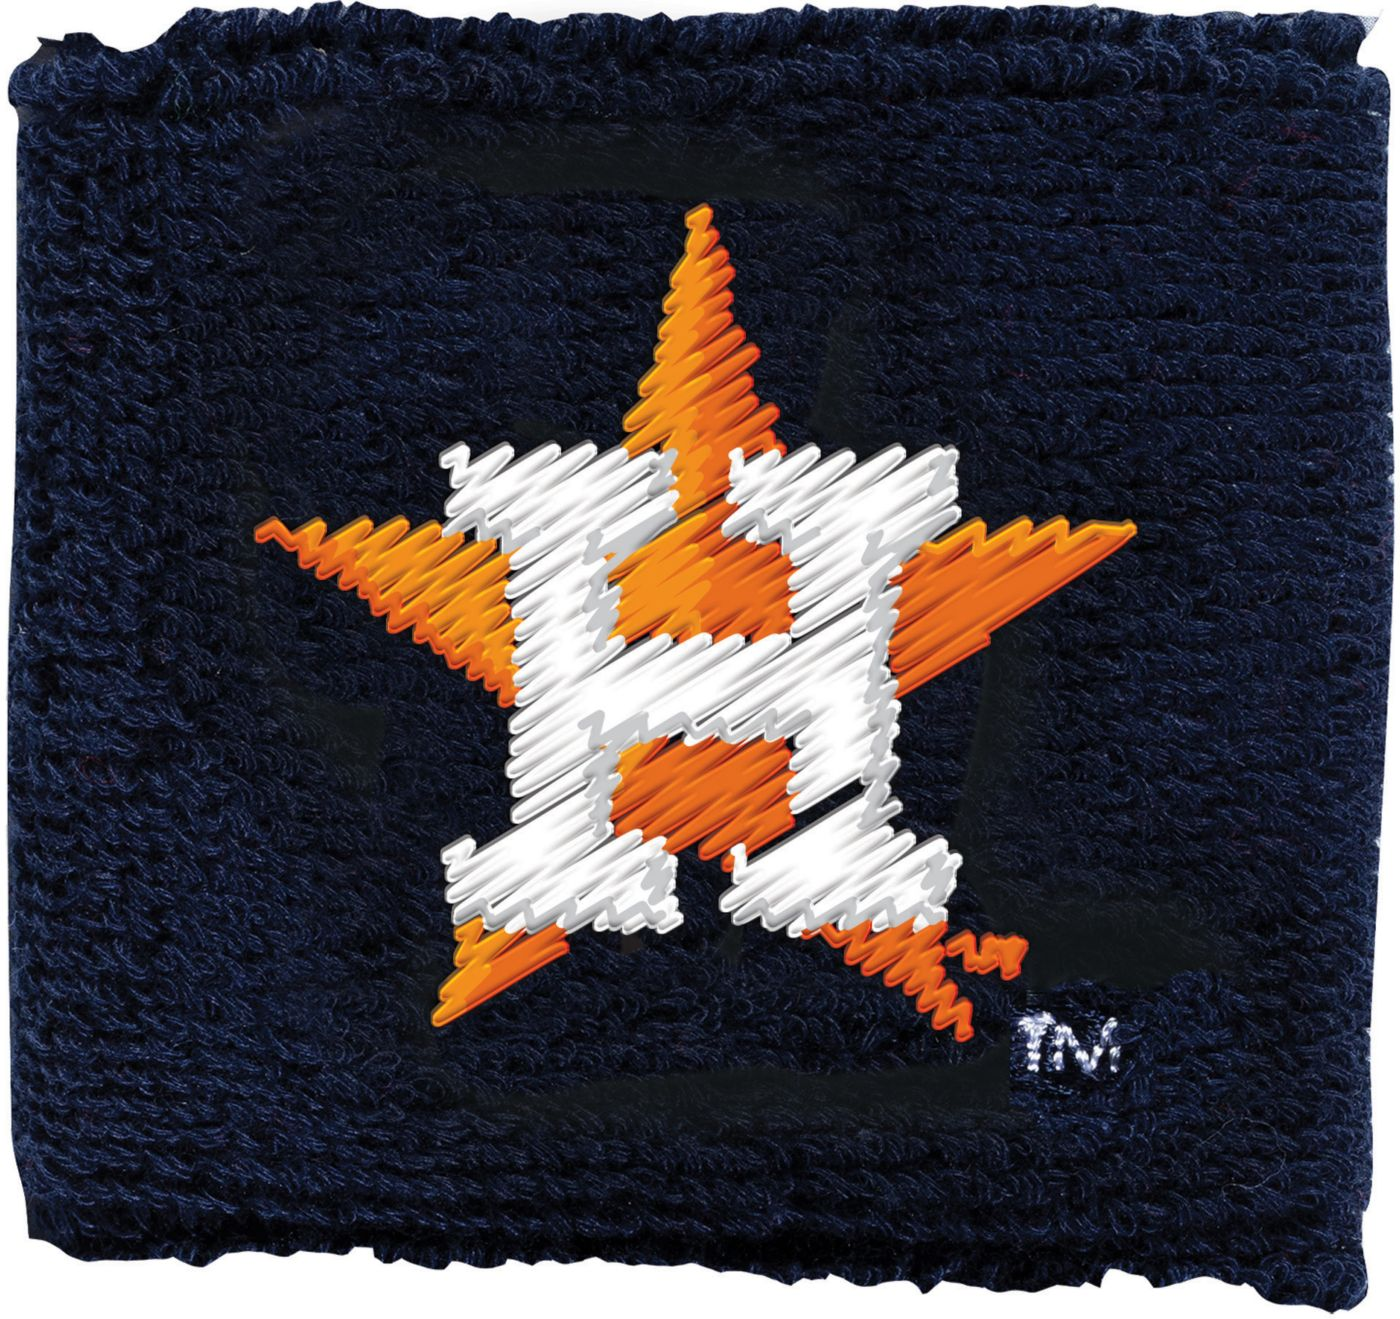 "Franklin Houston Astros Black 2.5"" Wristbands"